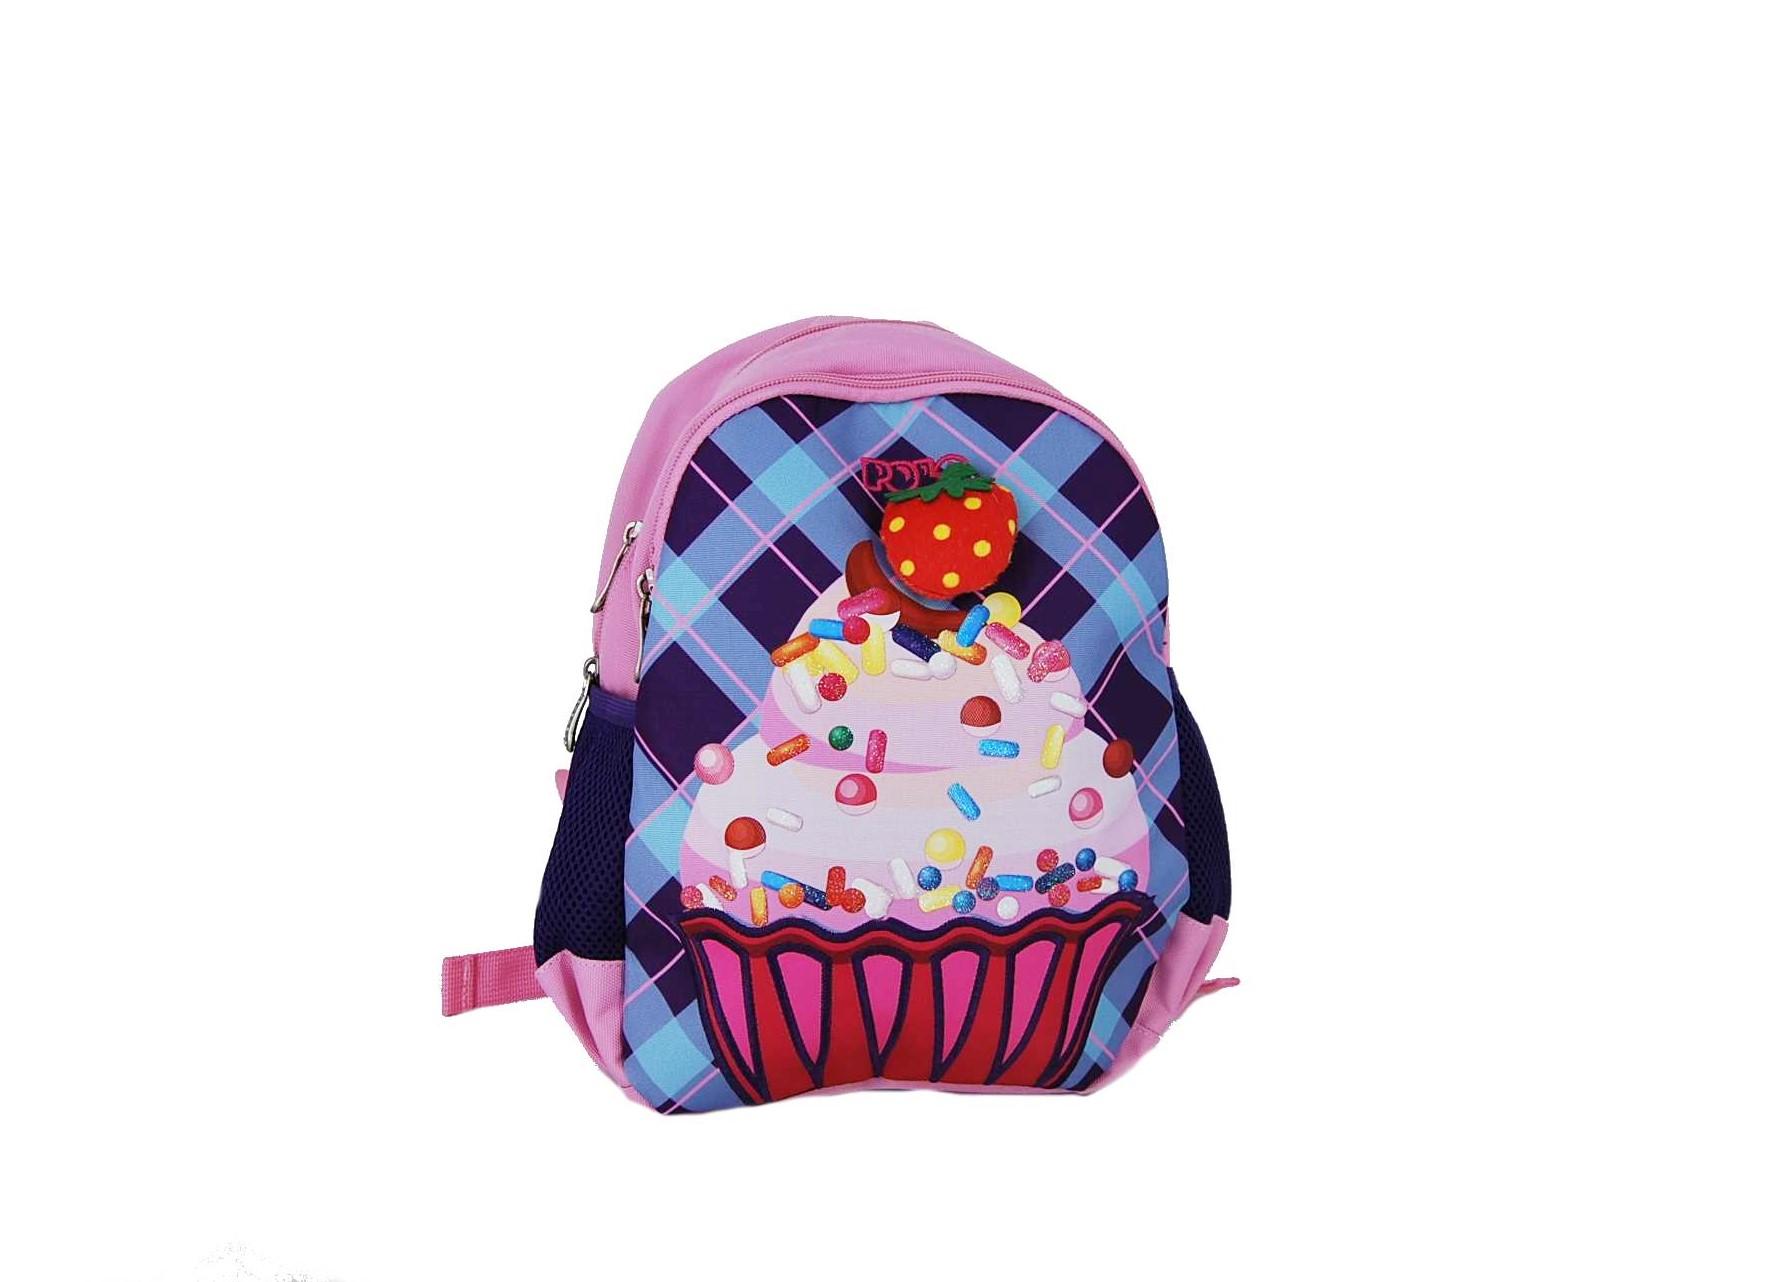 aa364f3db4f Polo παιδική τσάντα cupcake | Εισαγωγική Accessories